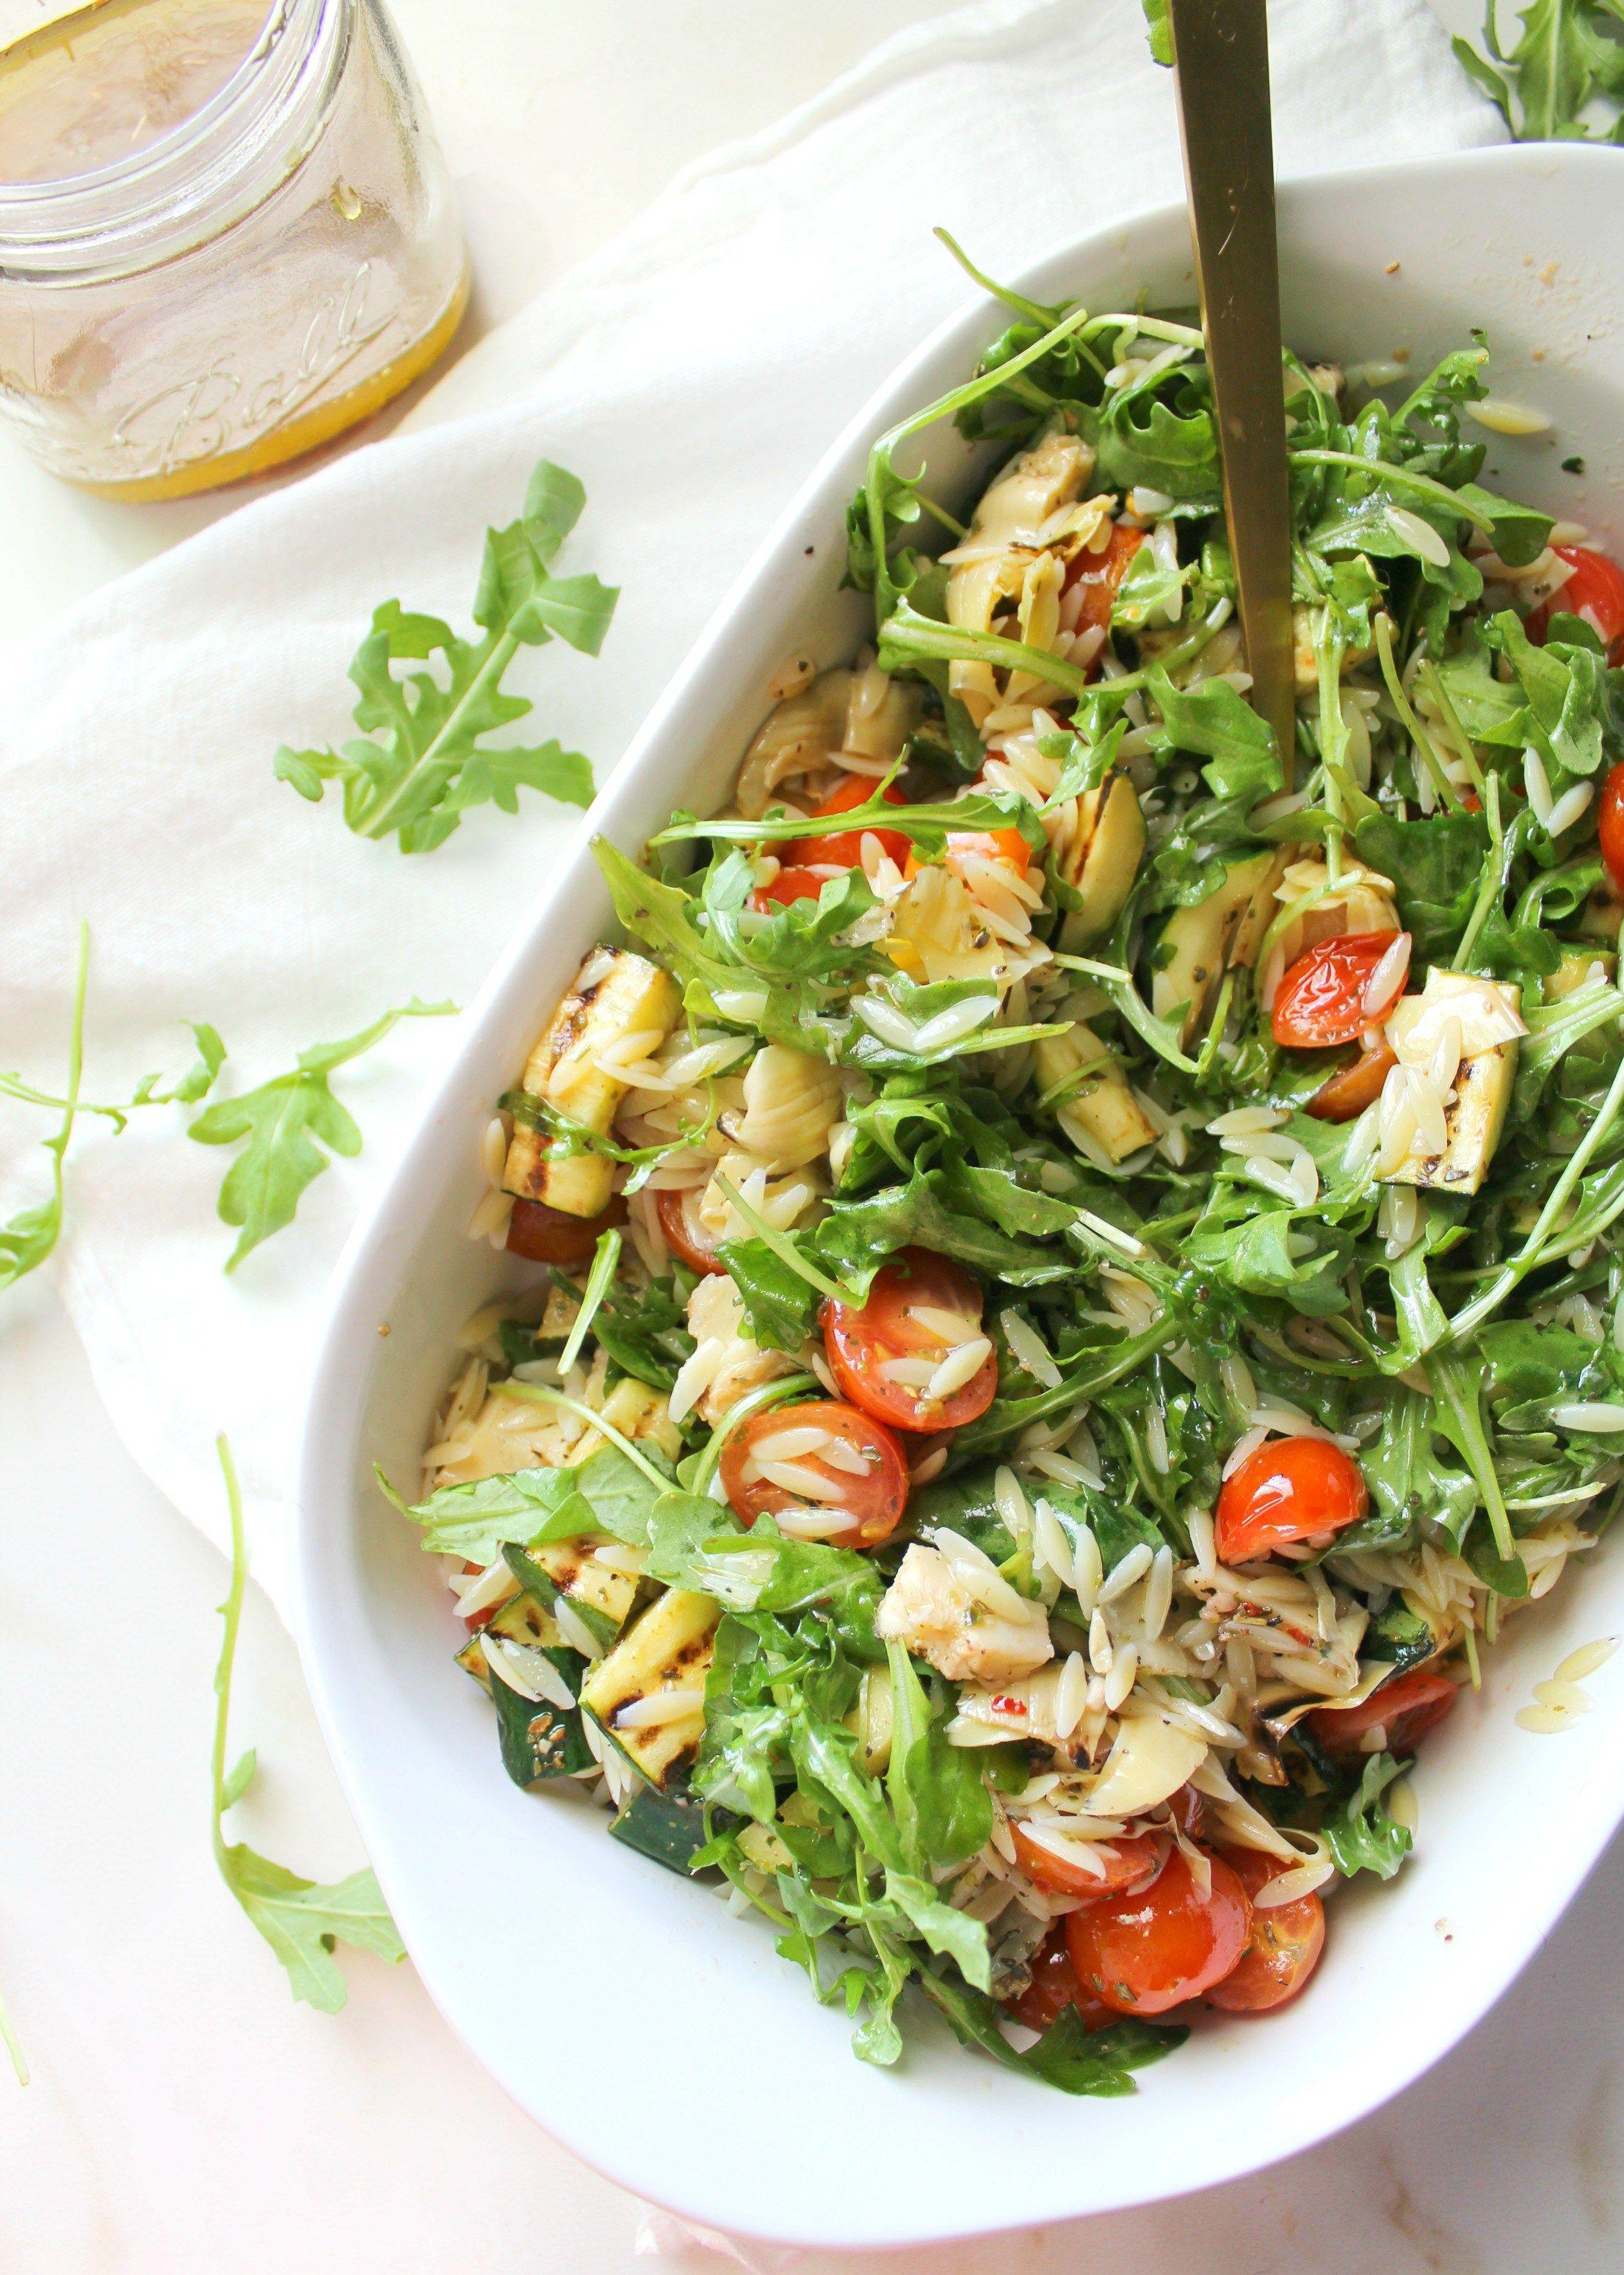 Vegan Orzo Pasta Salad With Grilled Veggies